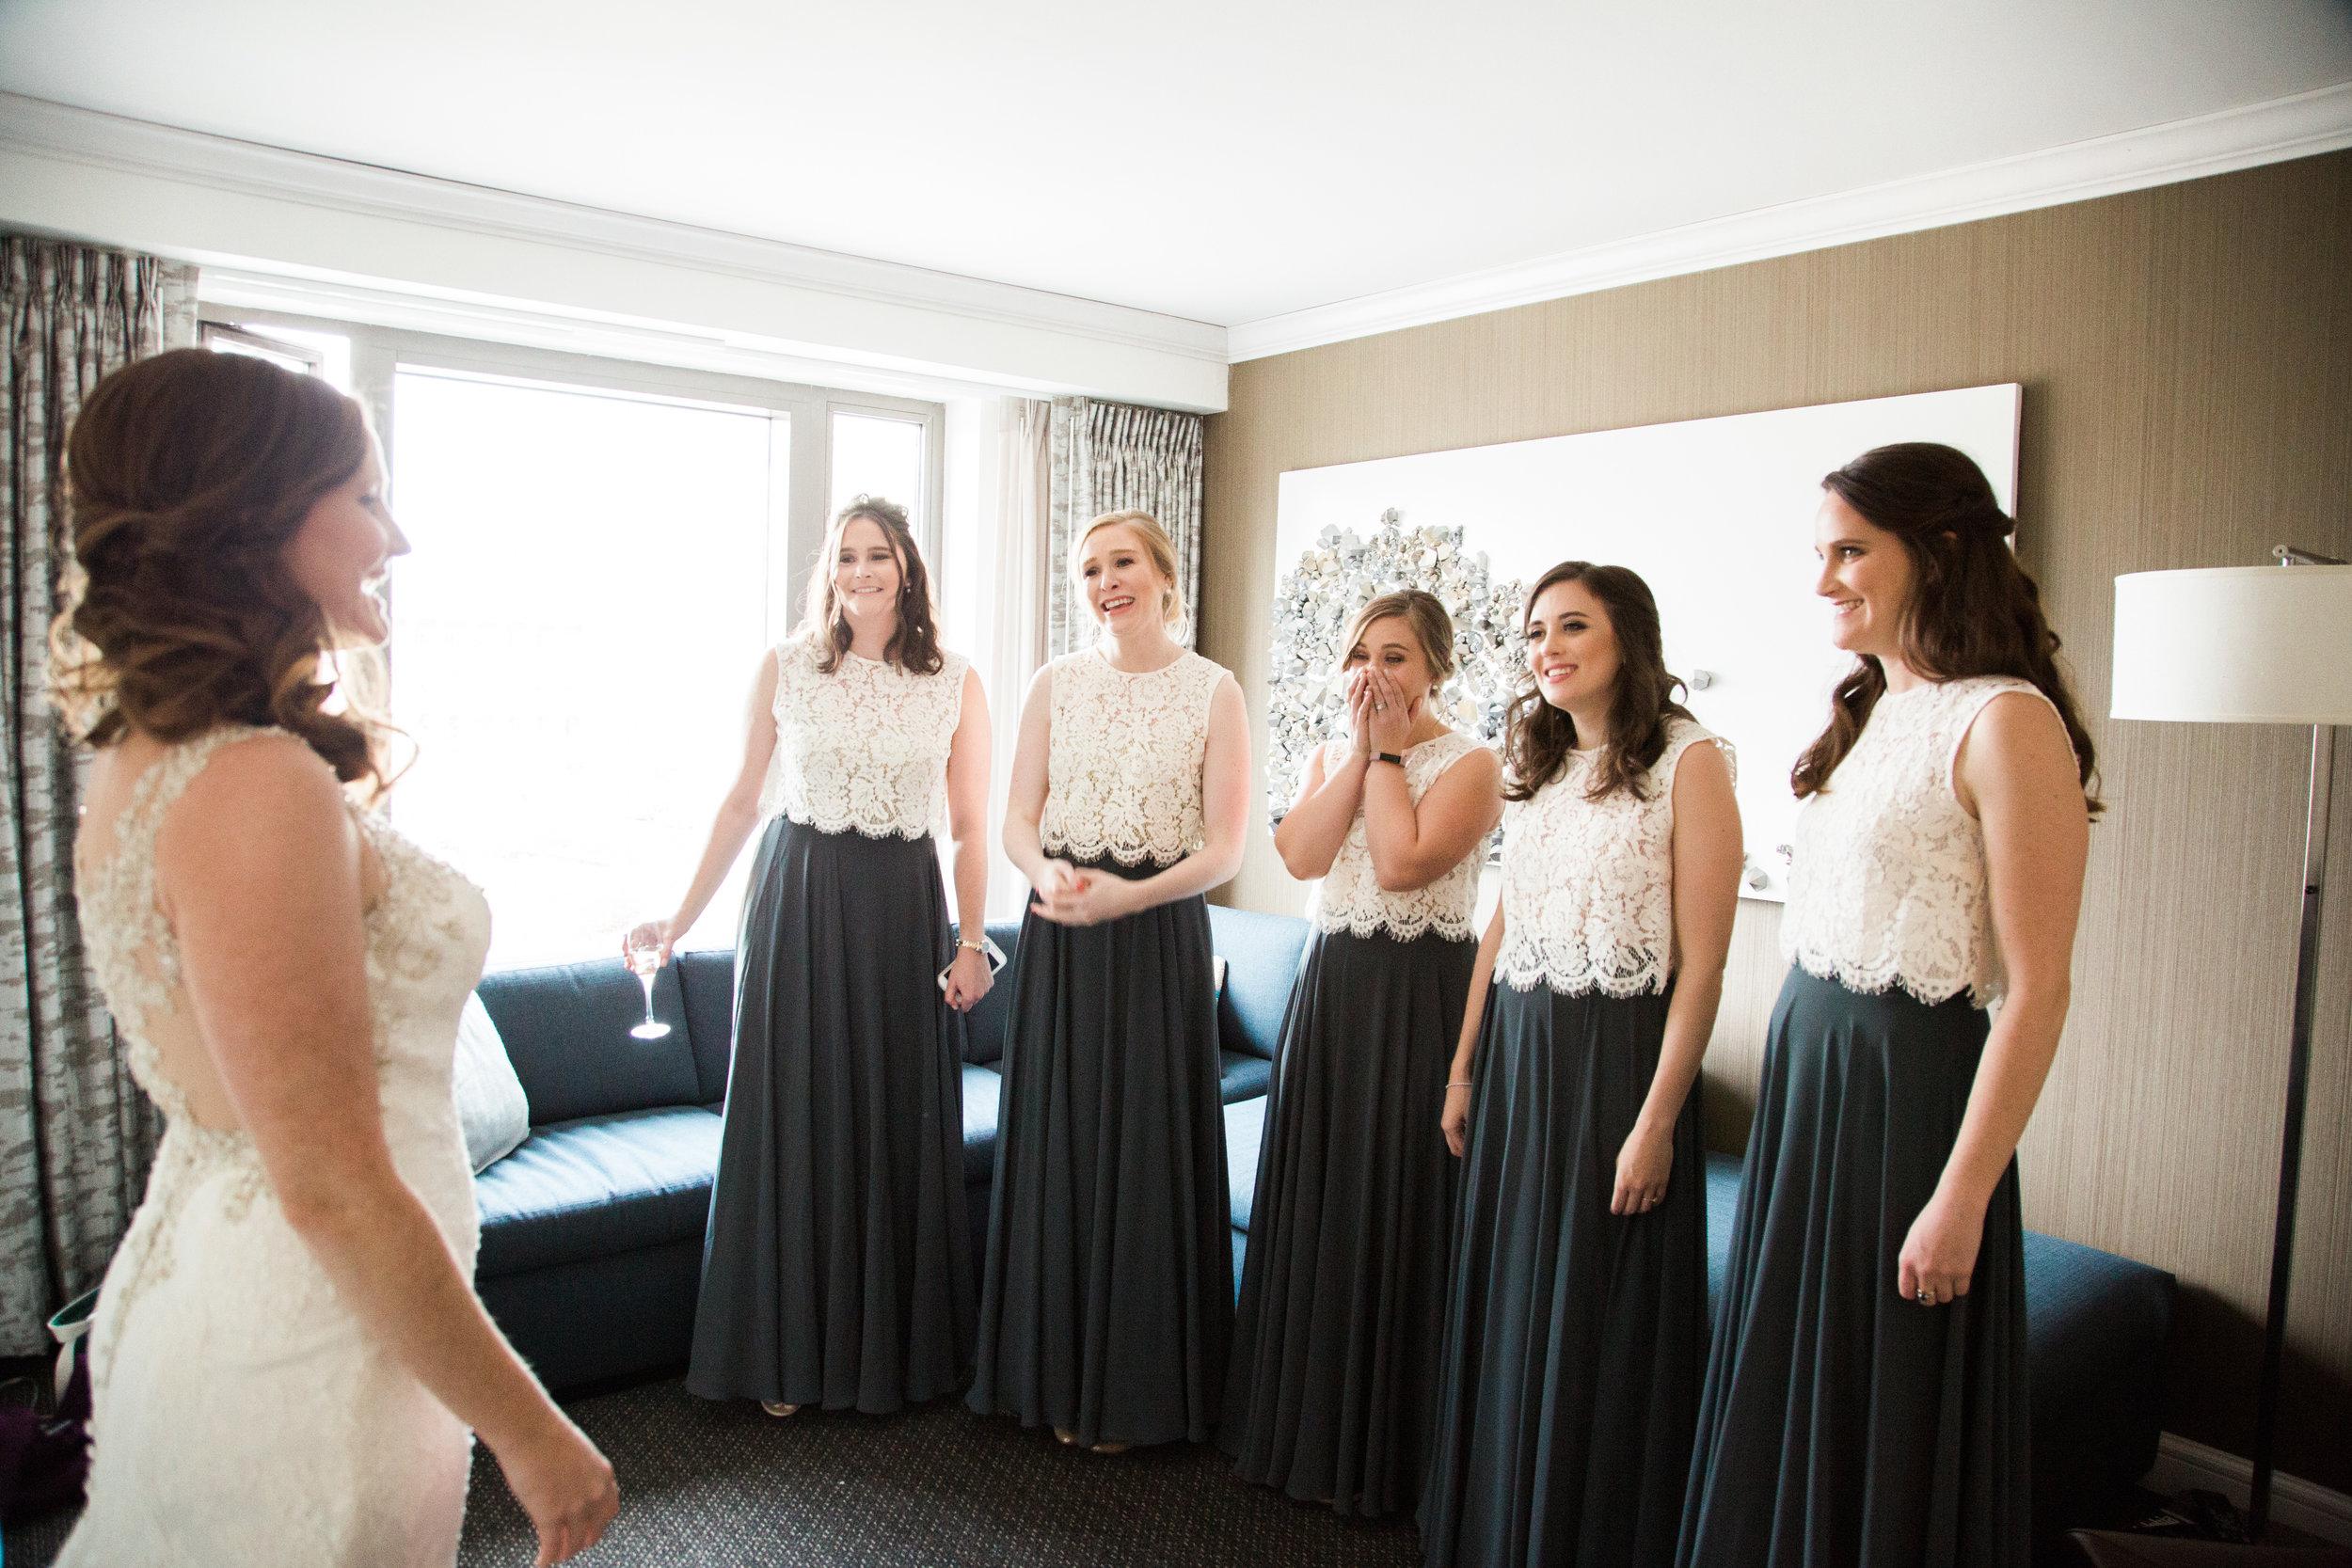 Hudson-Nichols-Martha-Stewart-Weddings-Winter-Ski-Philadelphia-Claire-Conner_030.jpg